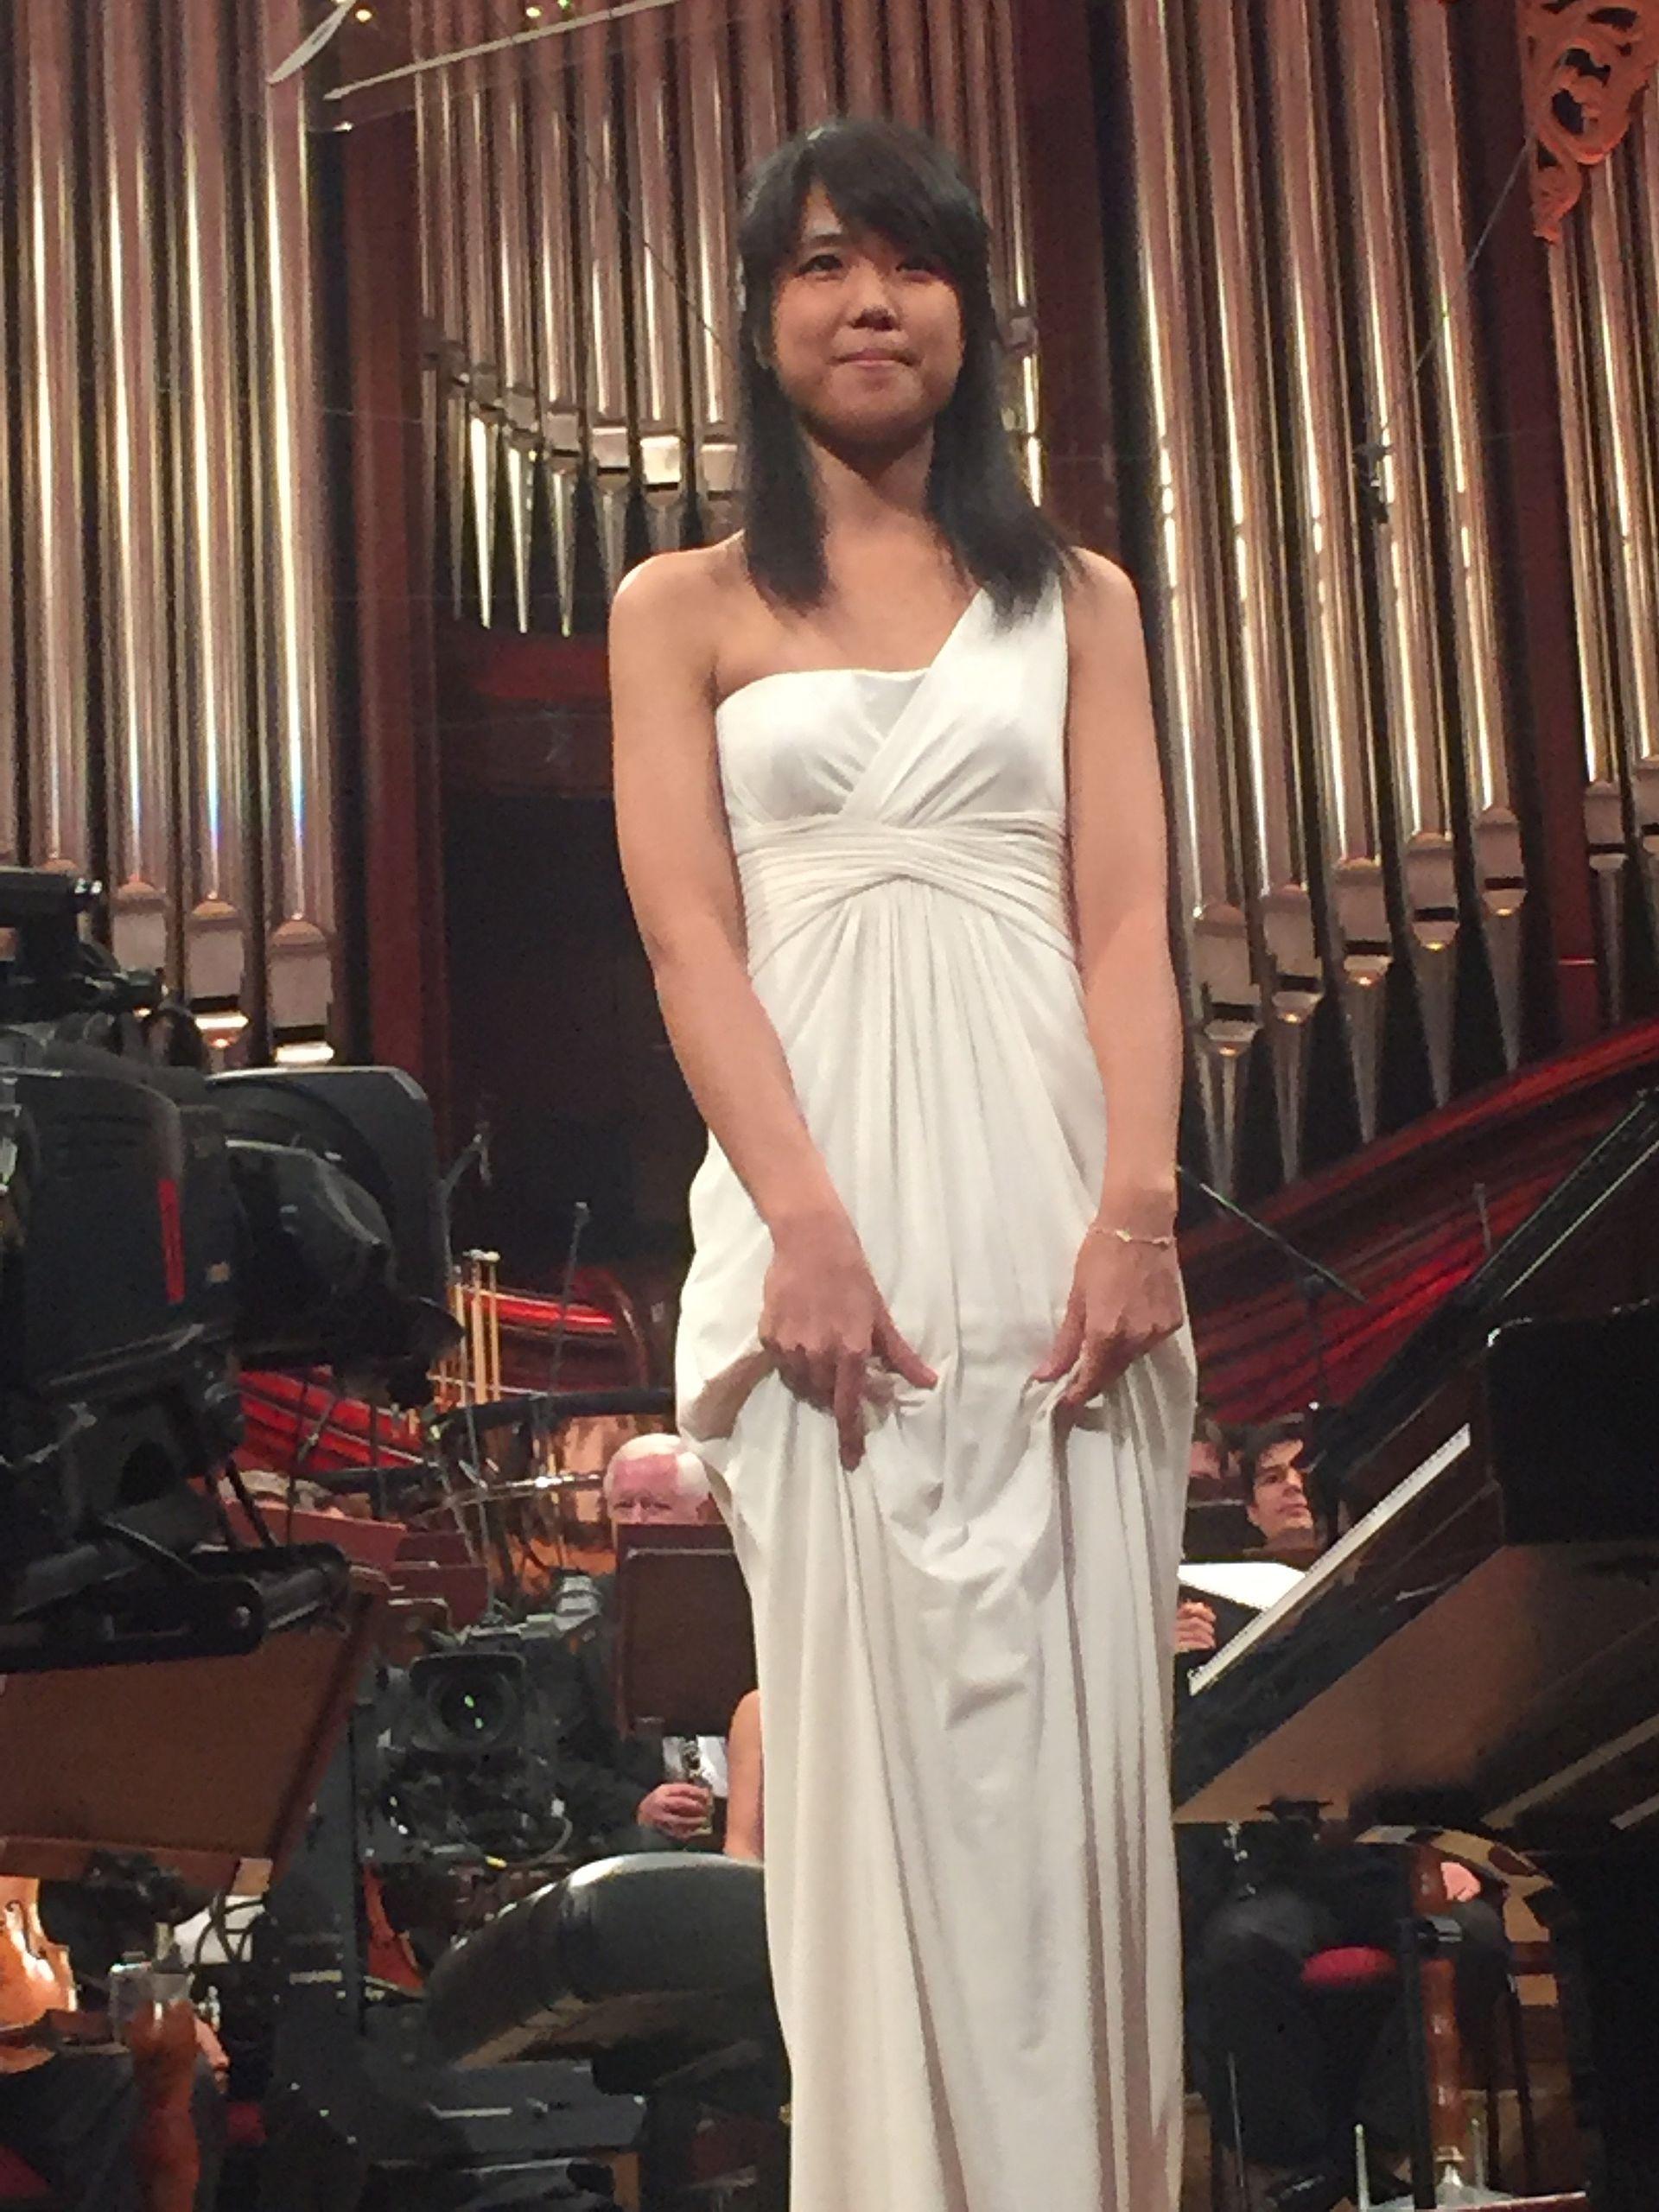 Kate Liu - Wikipedia